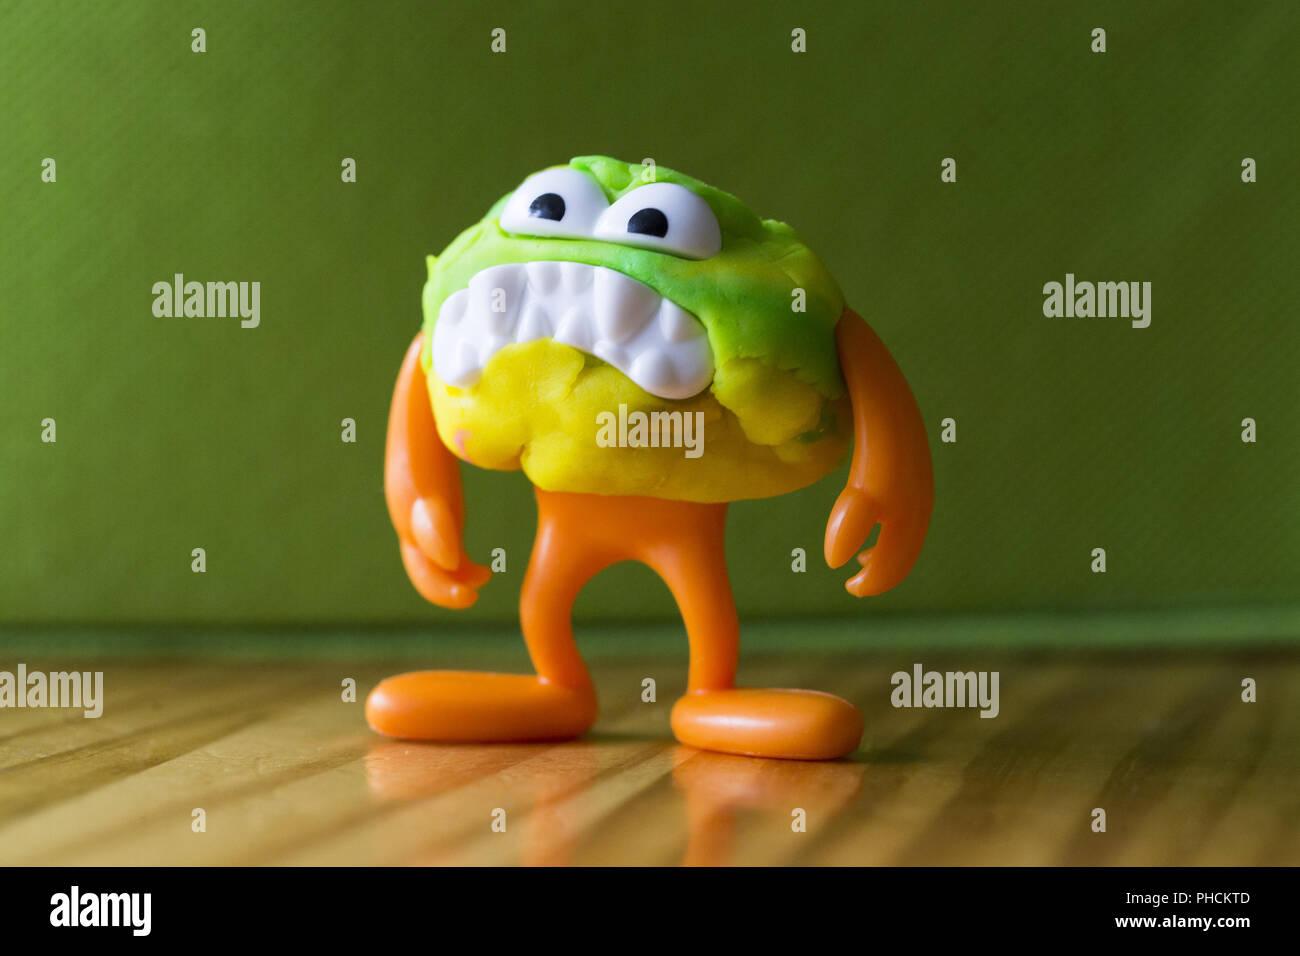 modeling clay figure - Stock Image